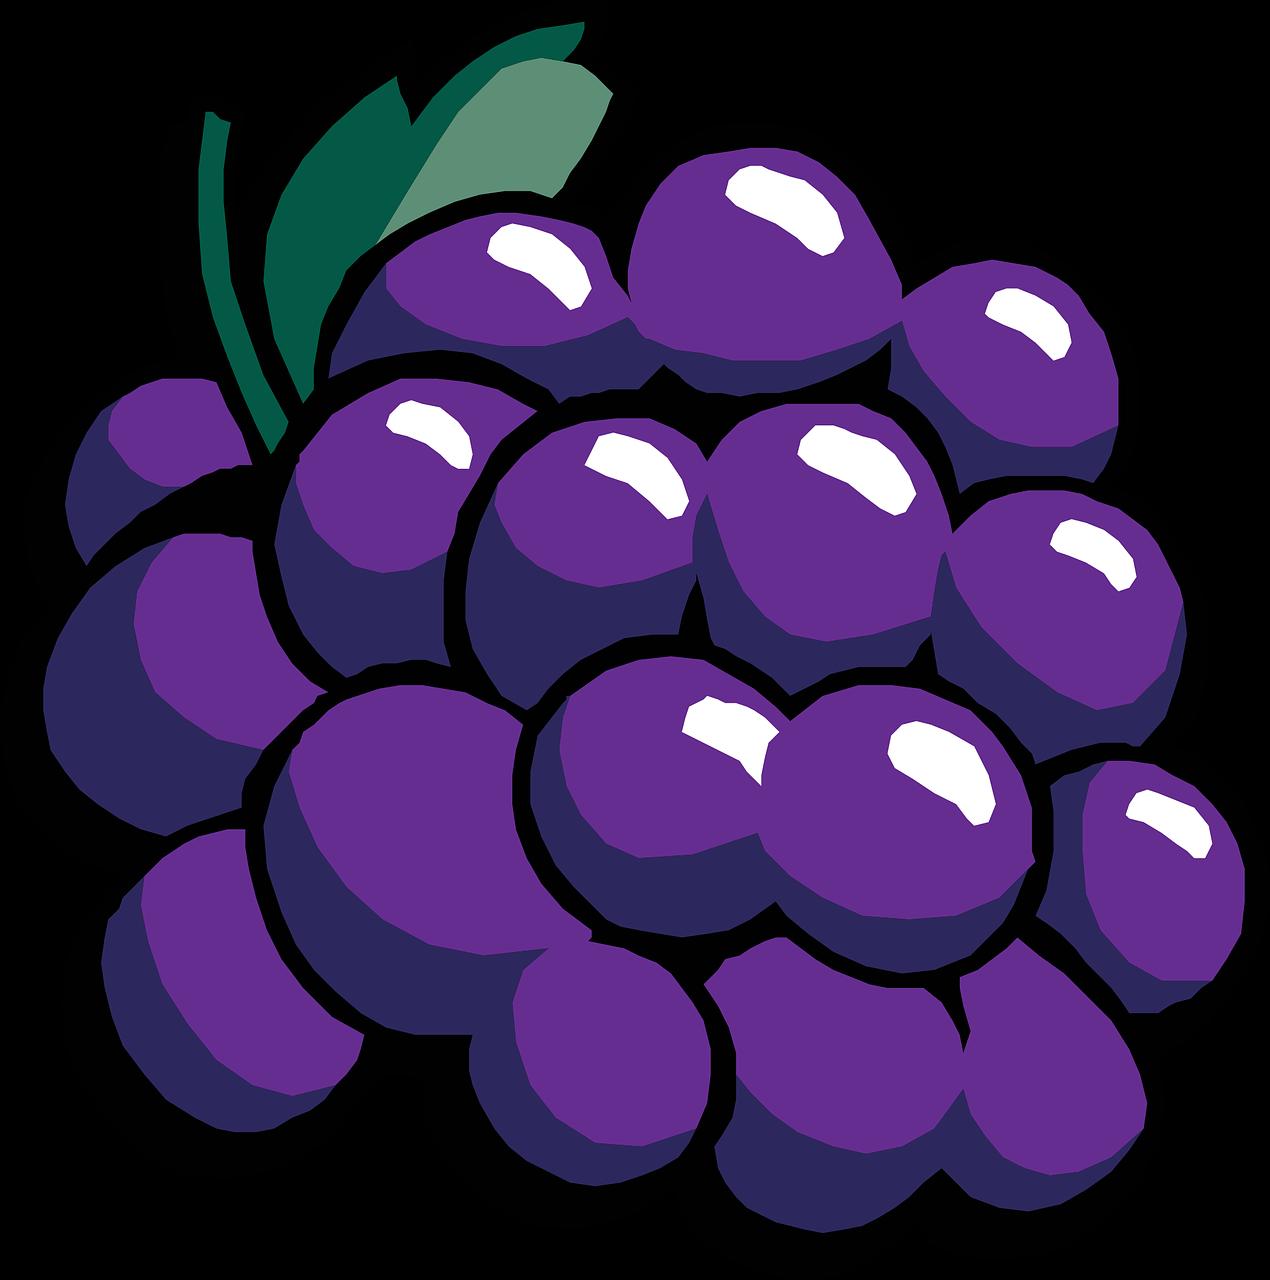 Food Grapes Fruit Ripe Wine Bunch Food Vineyard Food Grapes Fruit Ripe Wine Bunch Food Vineyard Clip Art Graphic Illustration Online Art